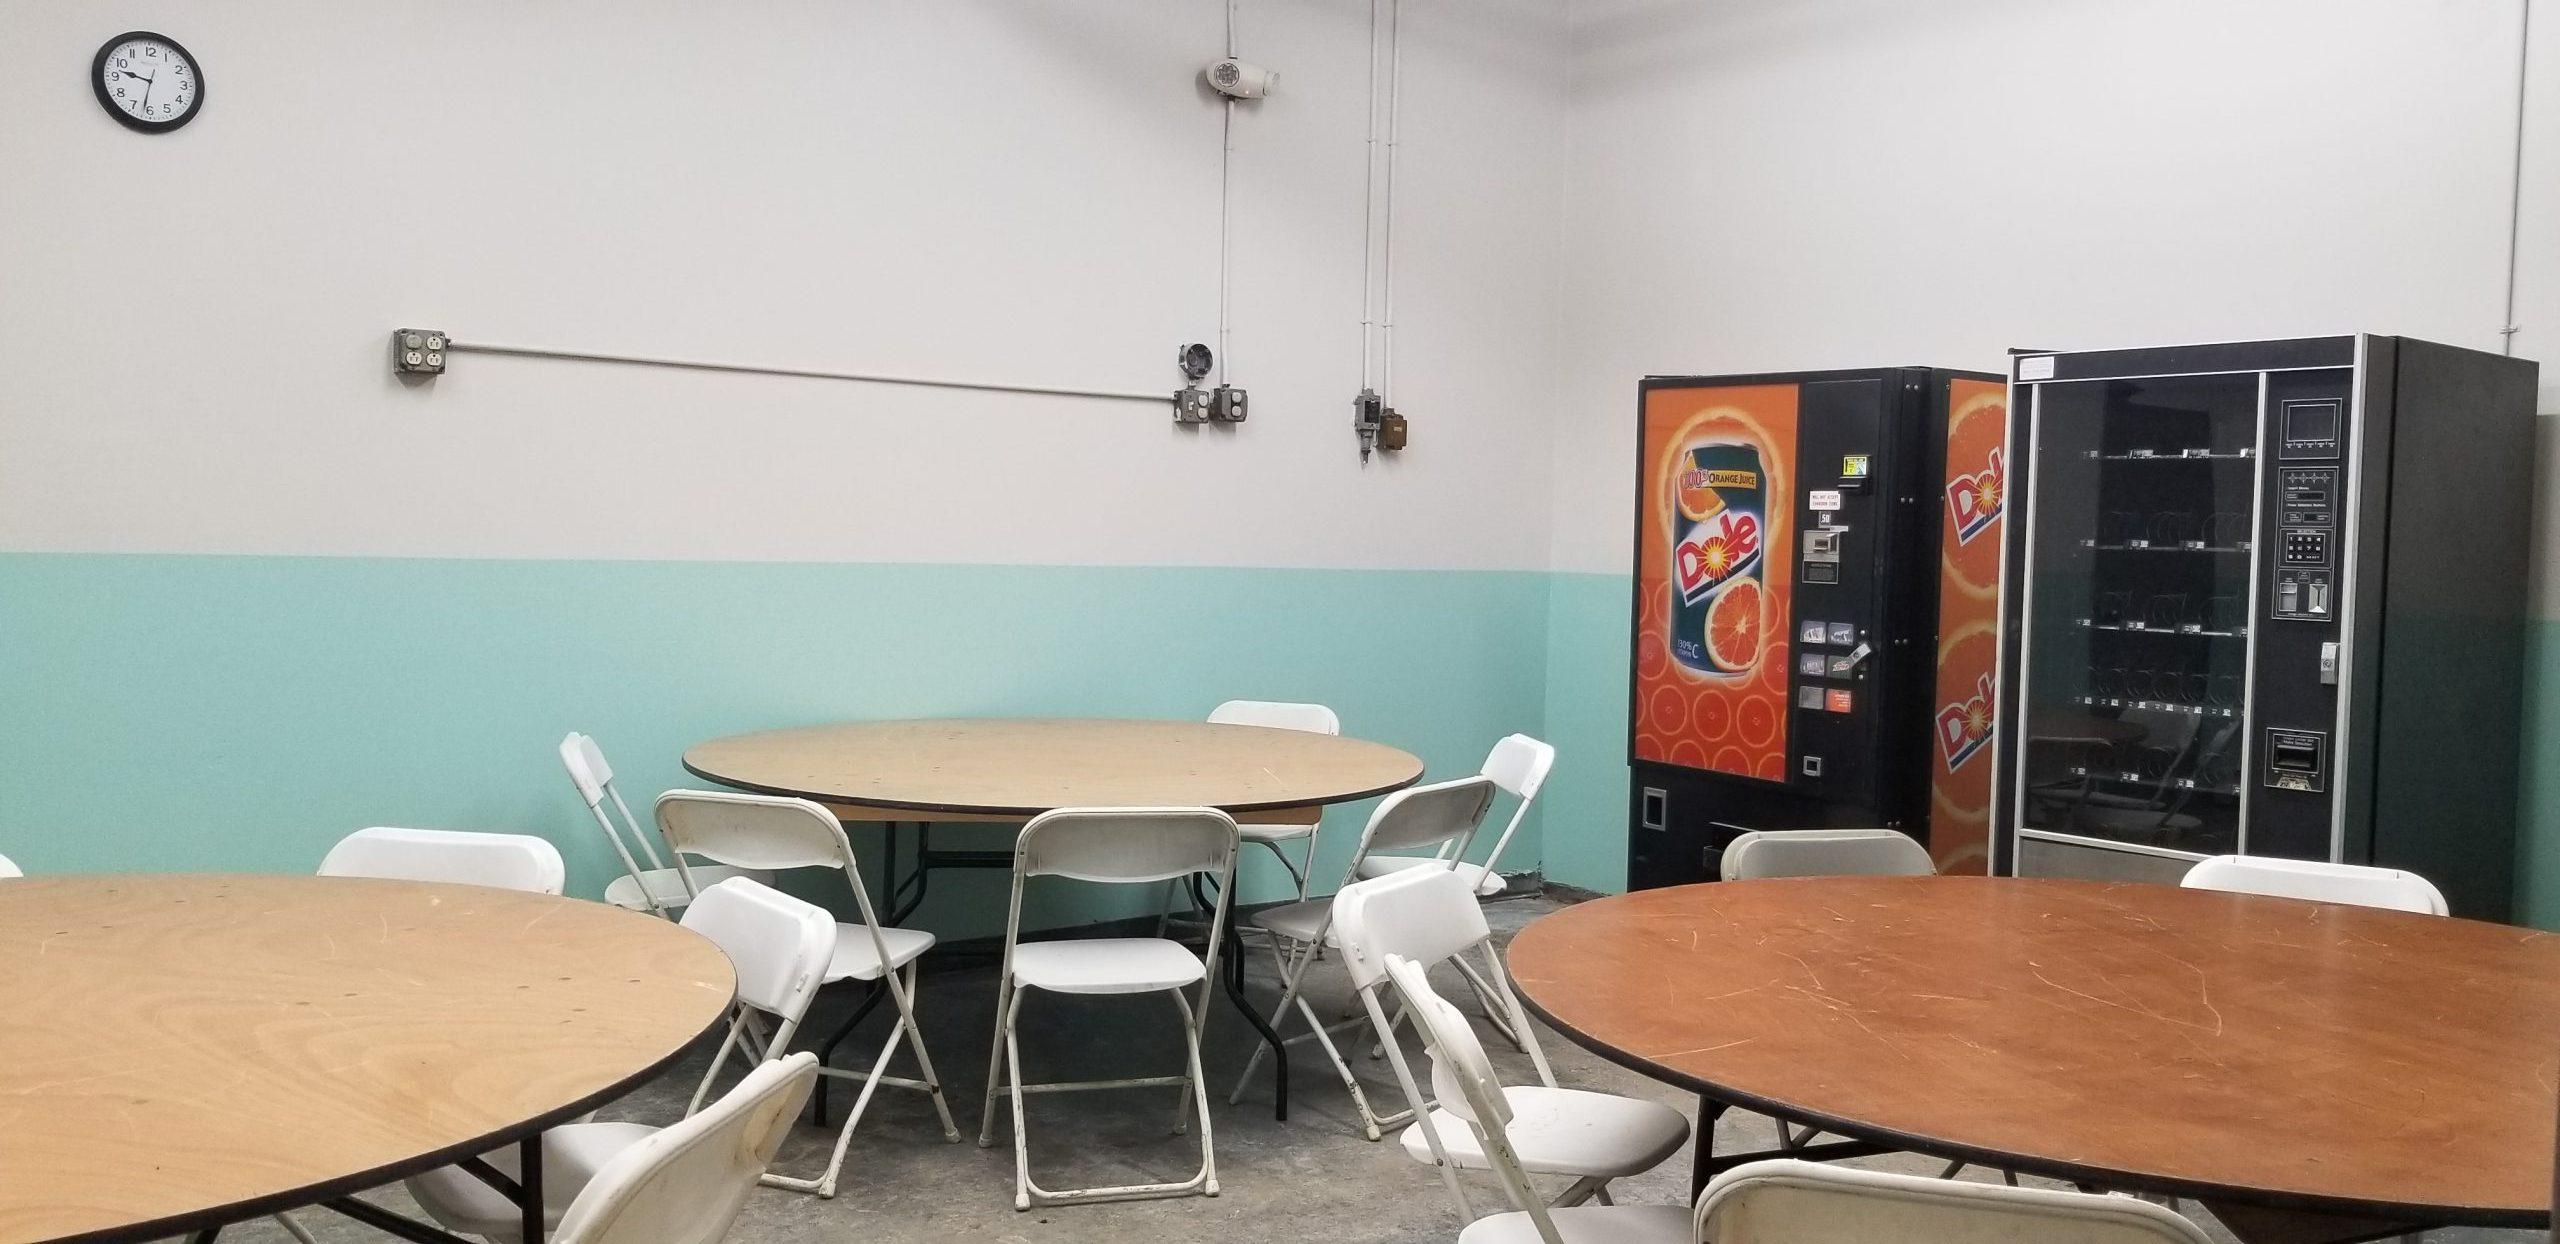 Bldg. 609 Breakroom